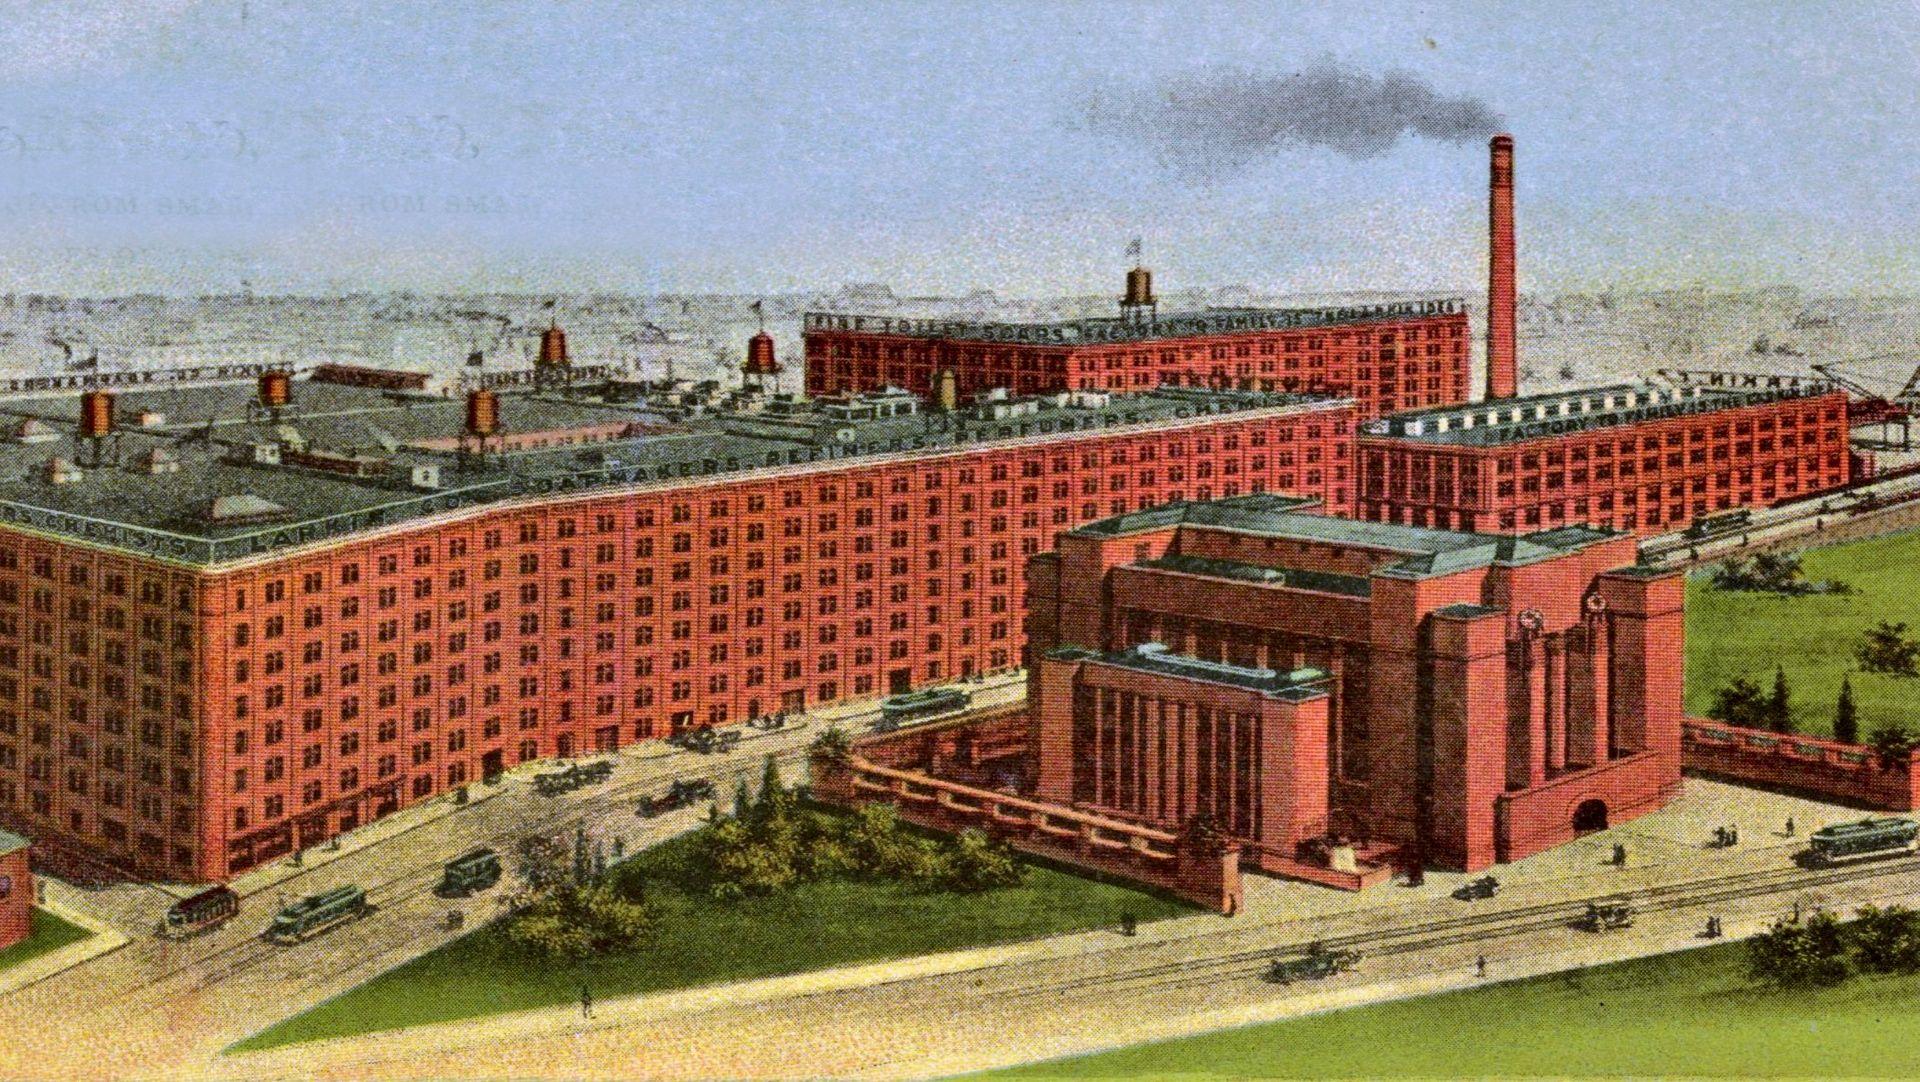 larkin company buffalo - Szukaj w Google | Frank Lloyd Wright ...